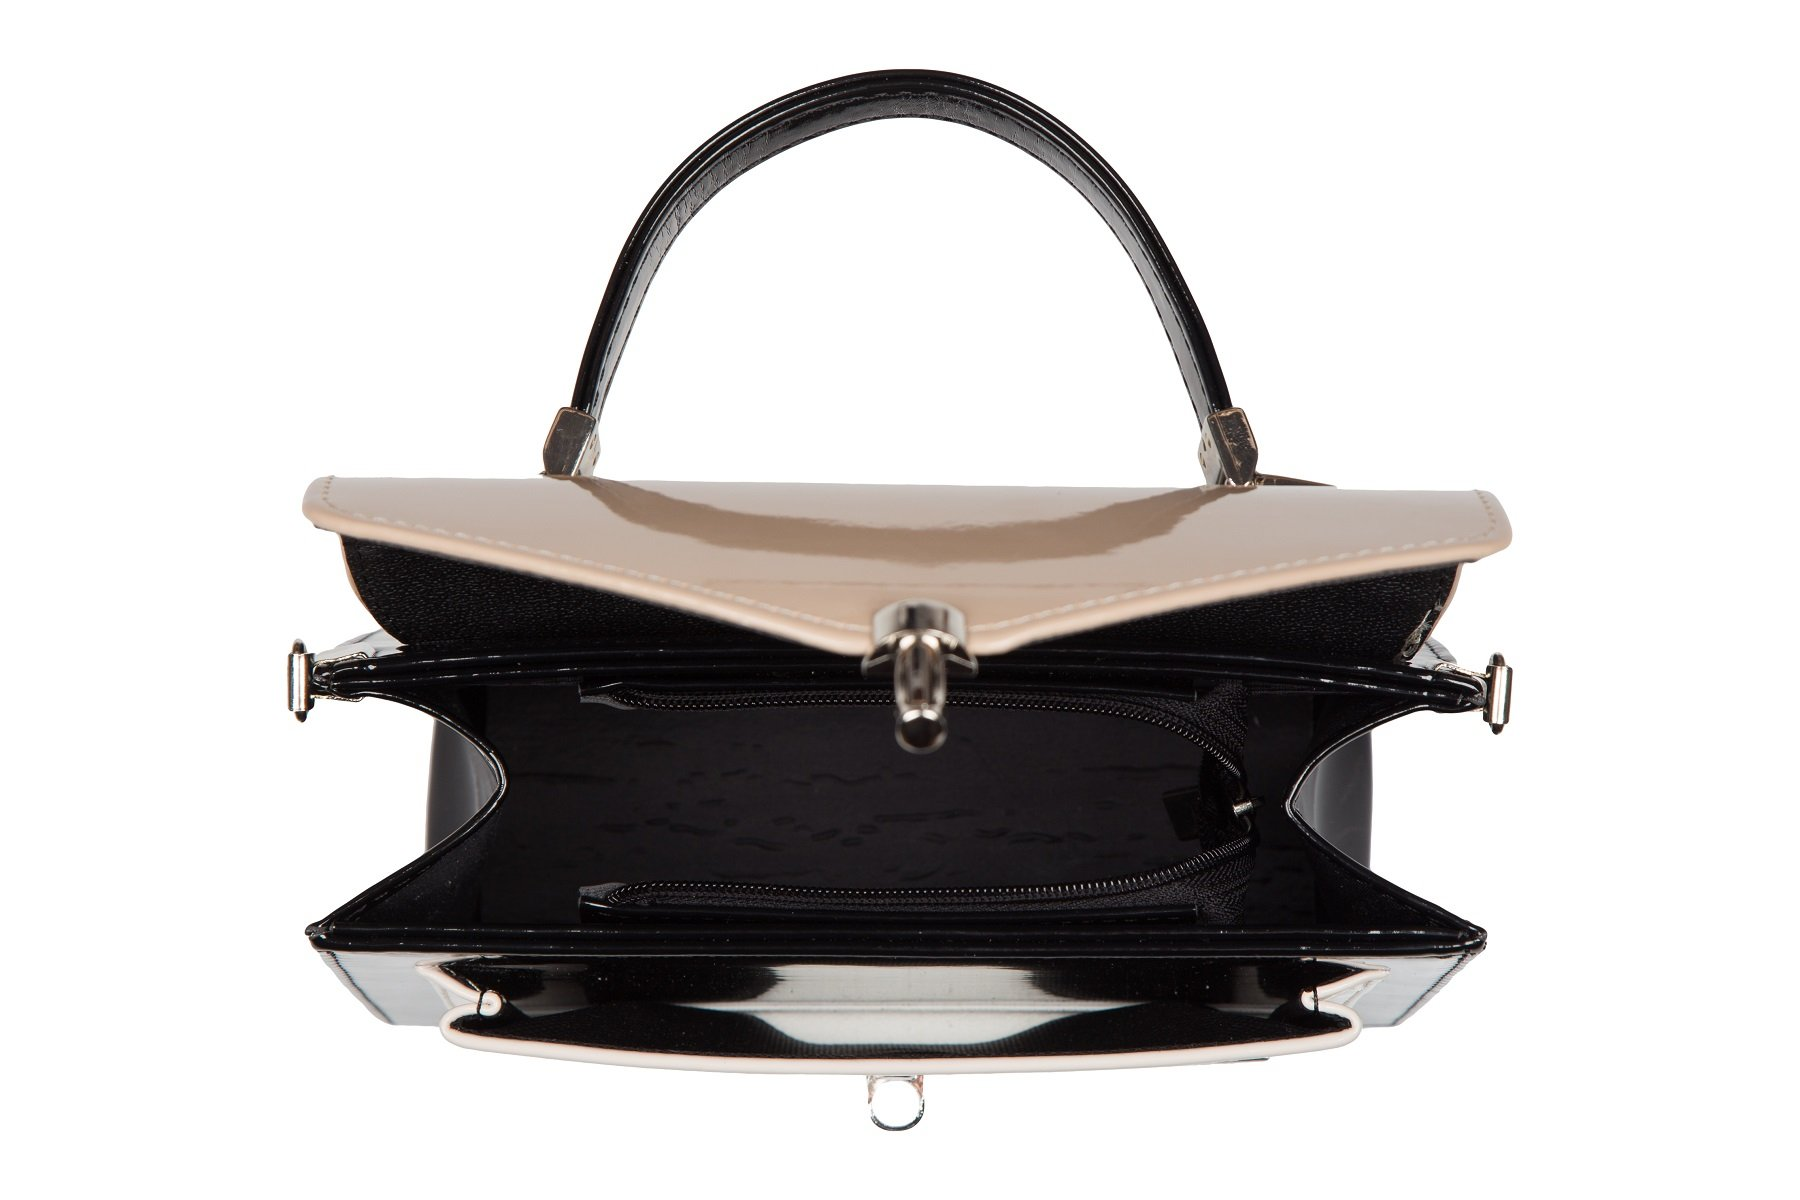 ef390686fbd7c Wizytowa lakierowana torebka damska elegancki mini kuferek teczka ...